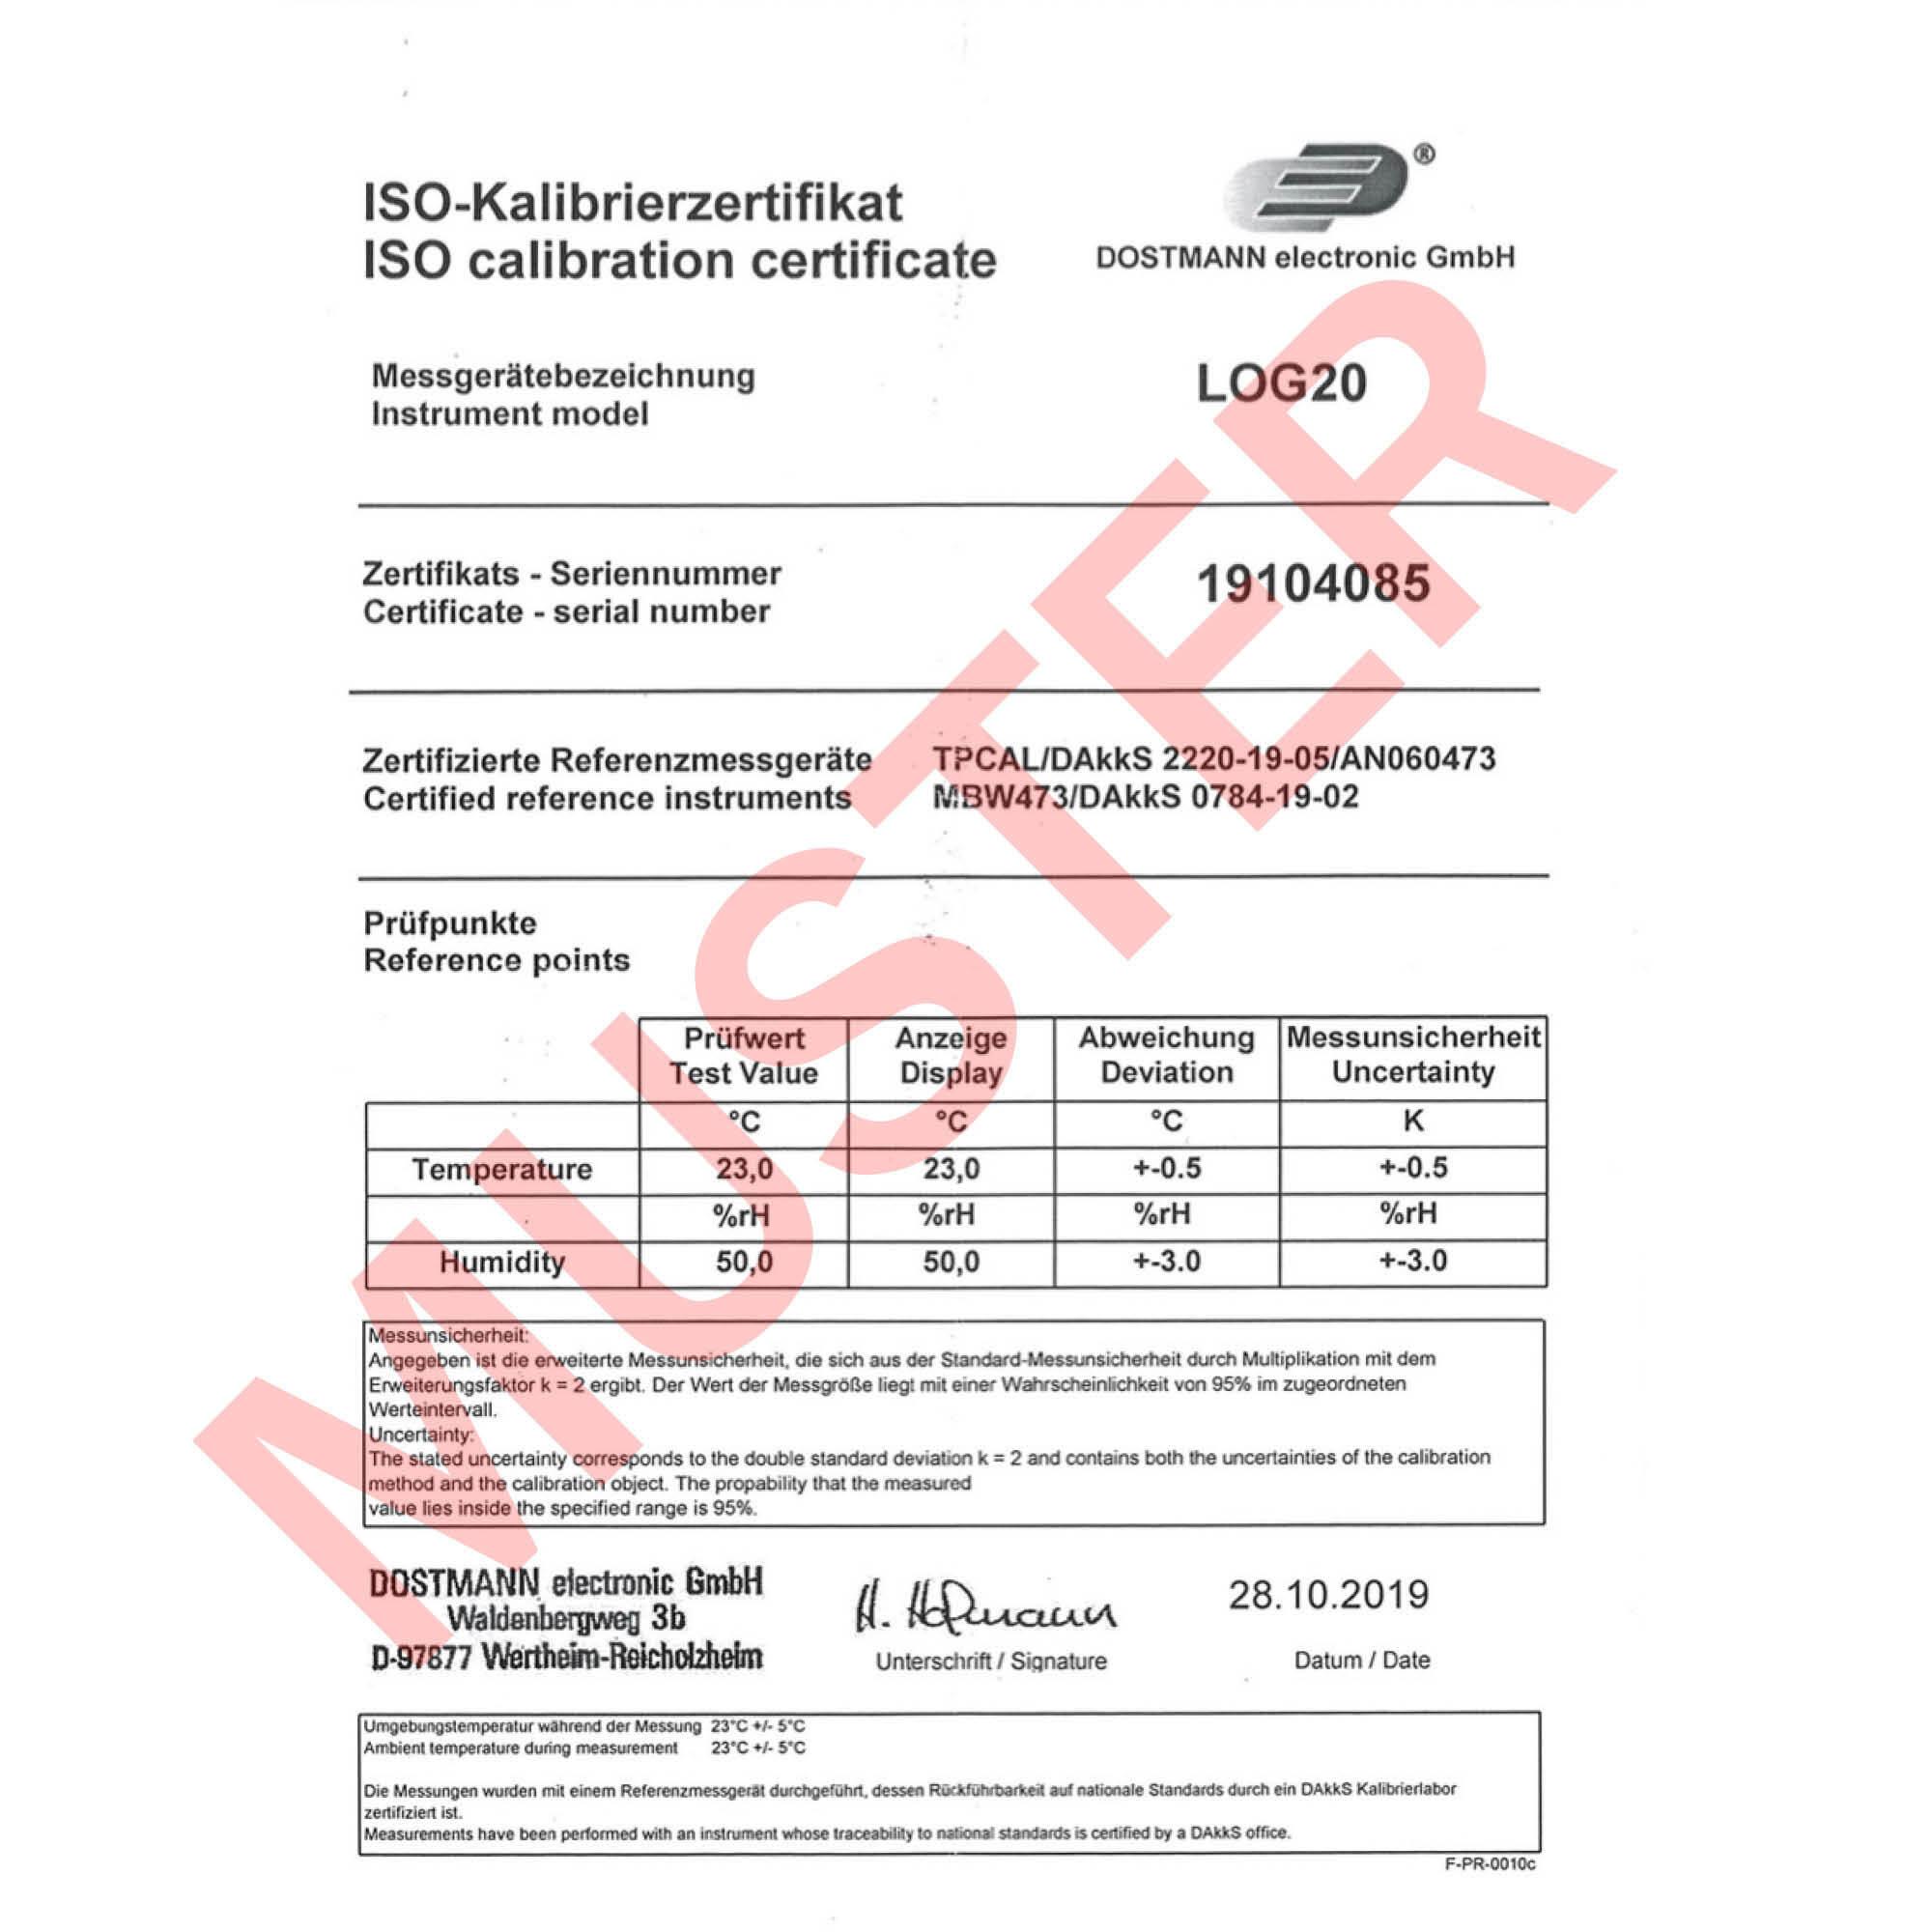 Zertifikat Muster Artikelnummer 311052.jpg